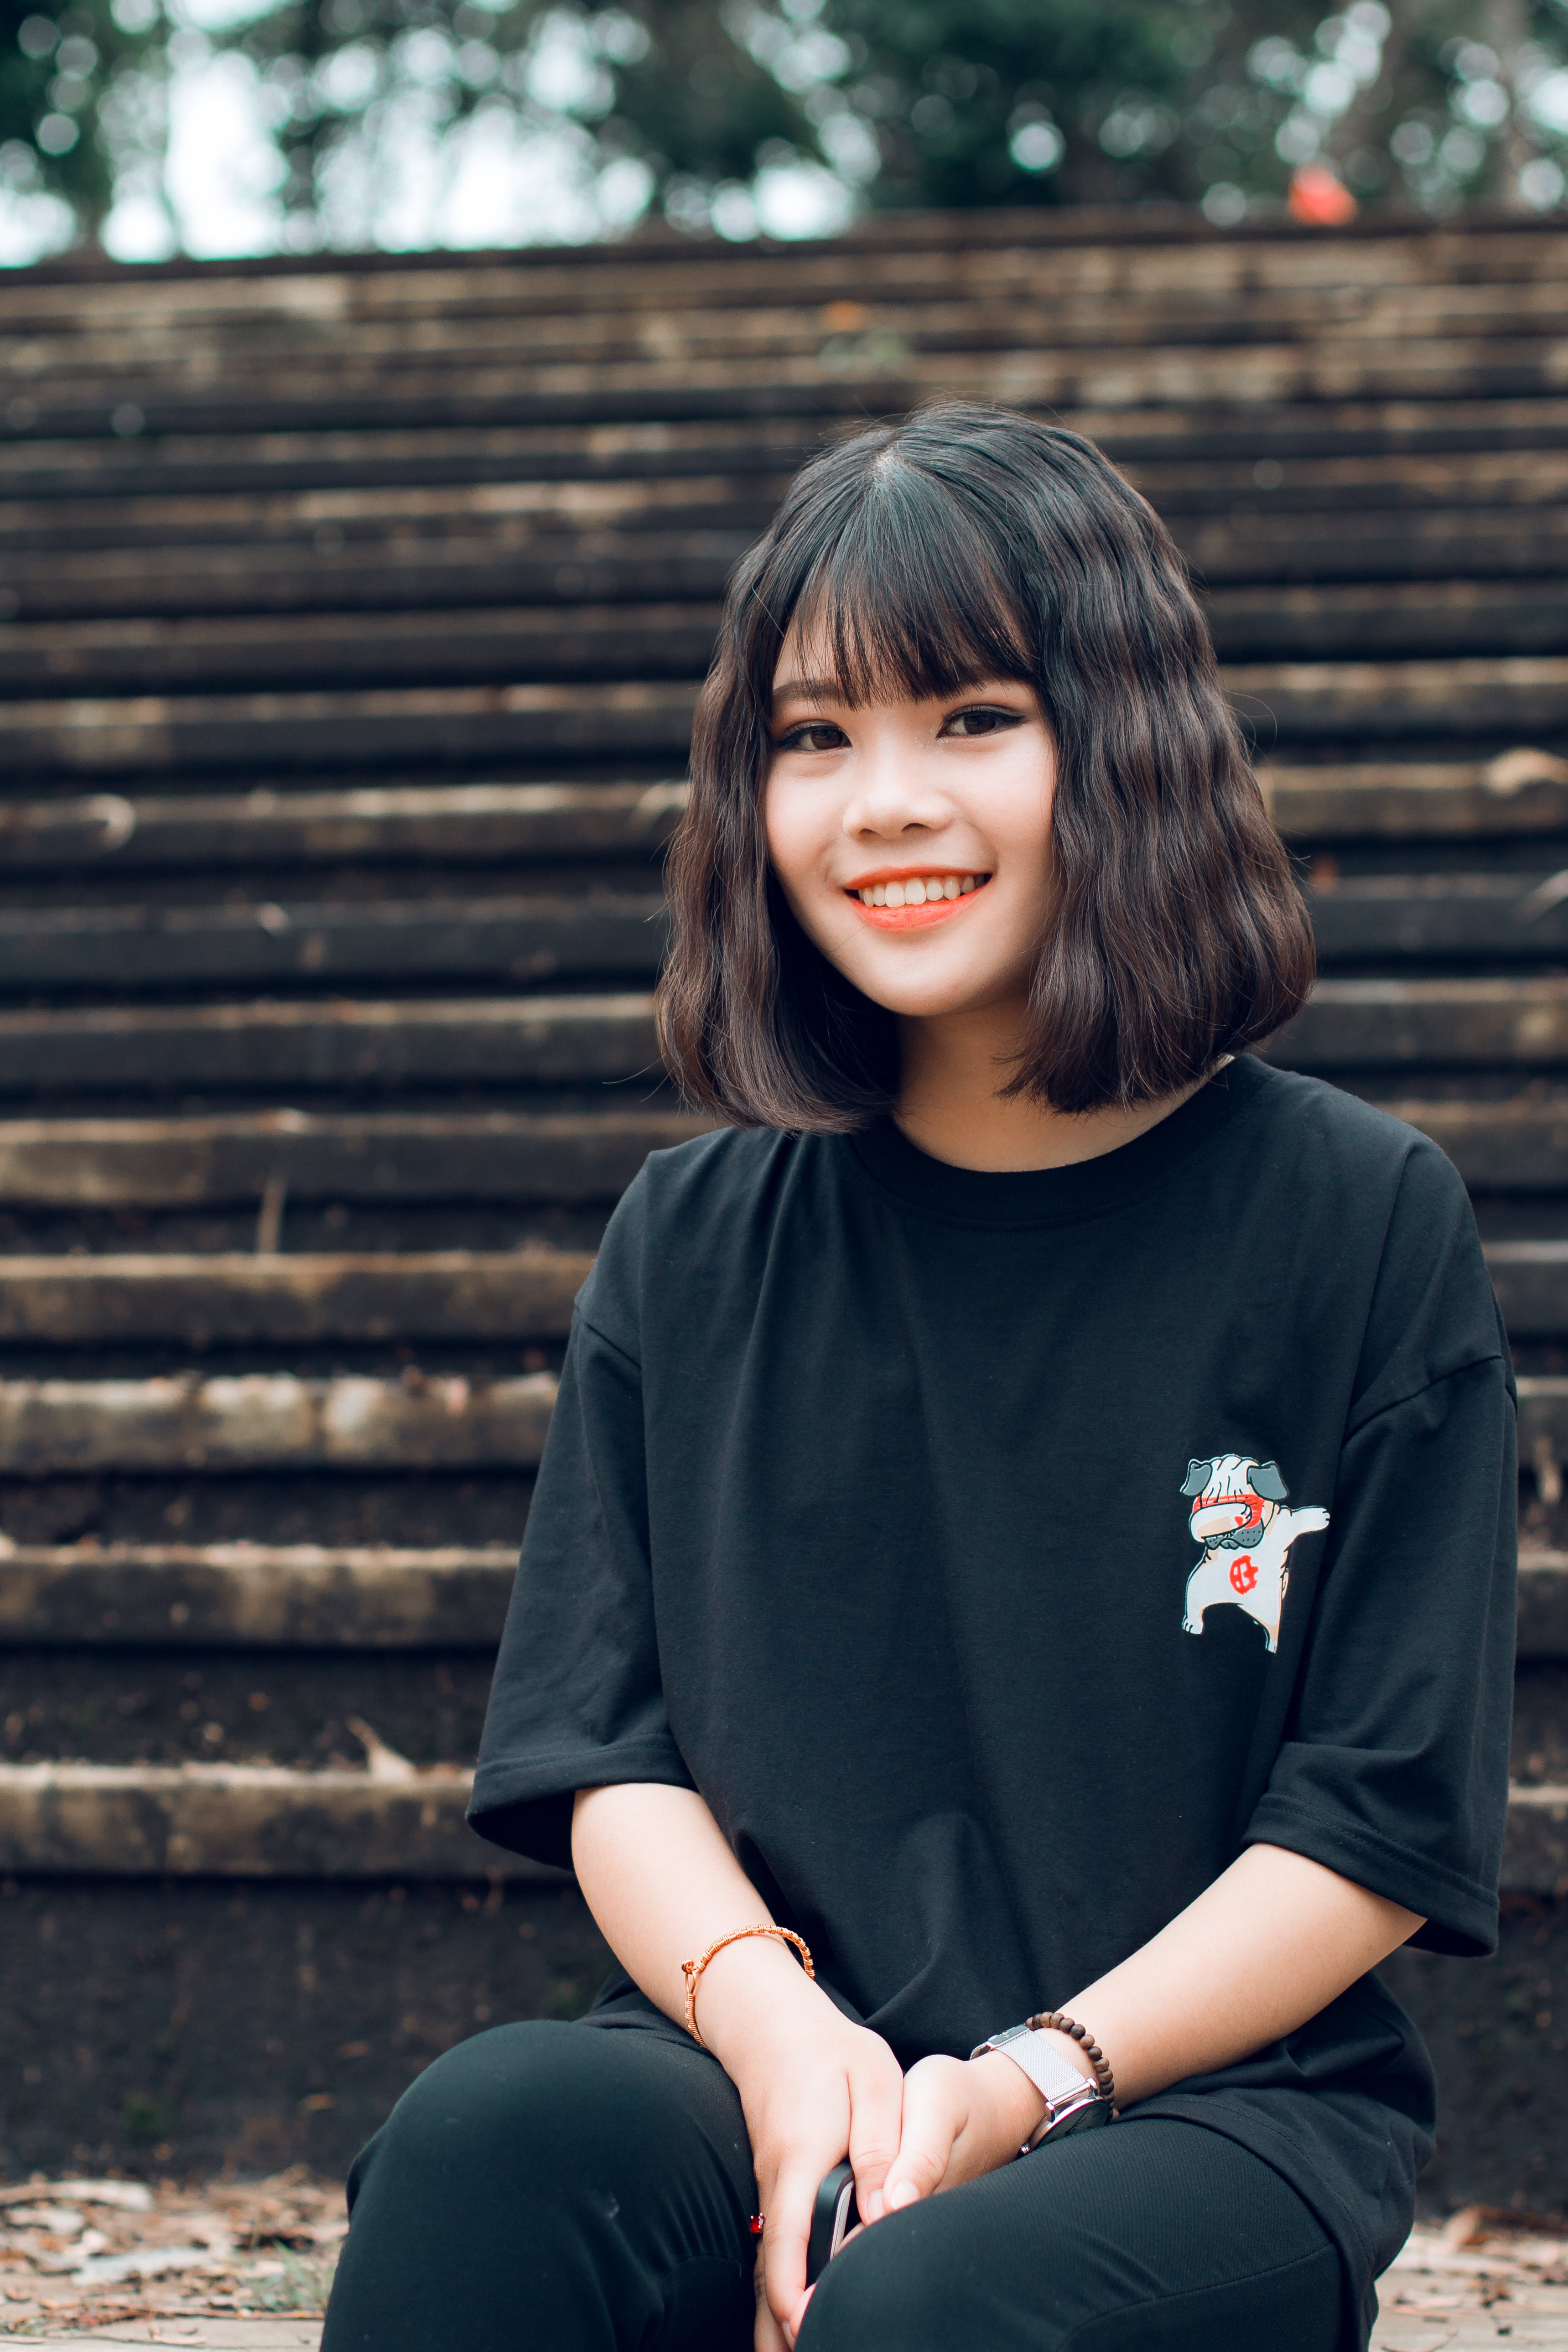 Woman Wearing Black Crew-neck T-shirt Sitting on Stair